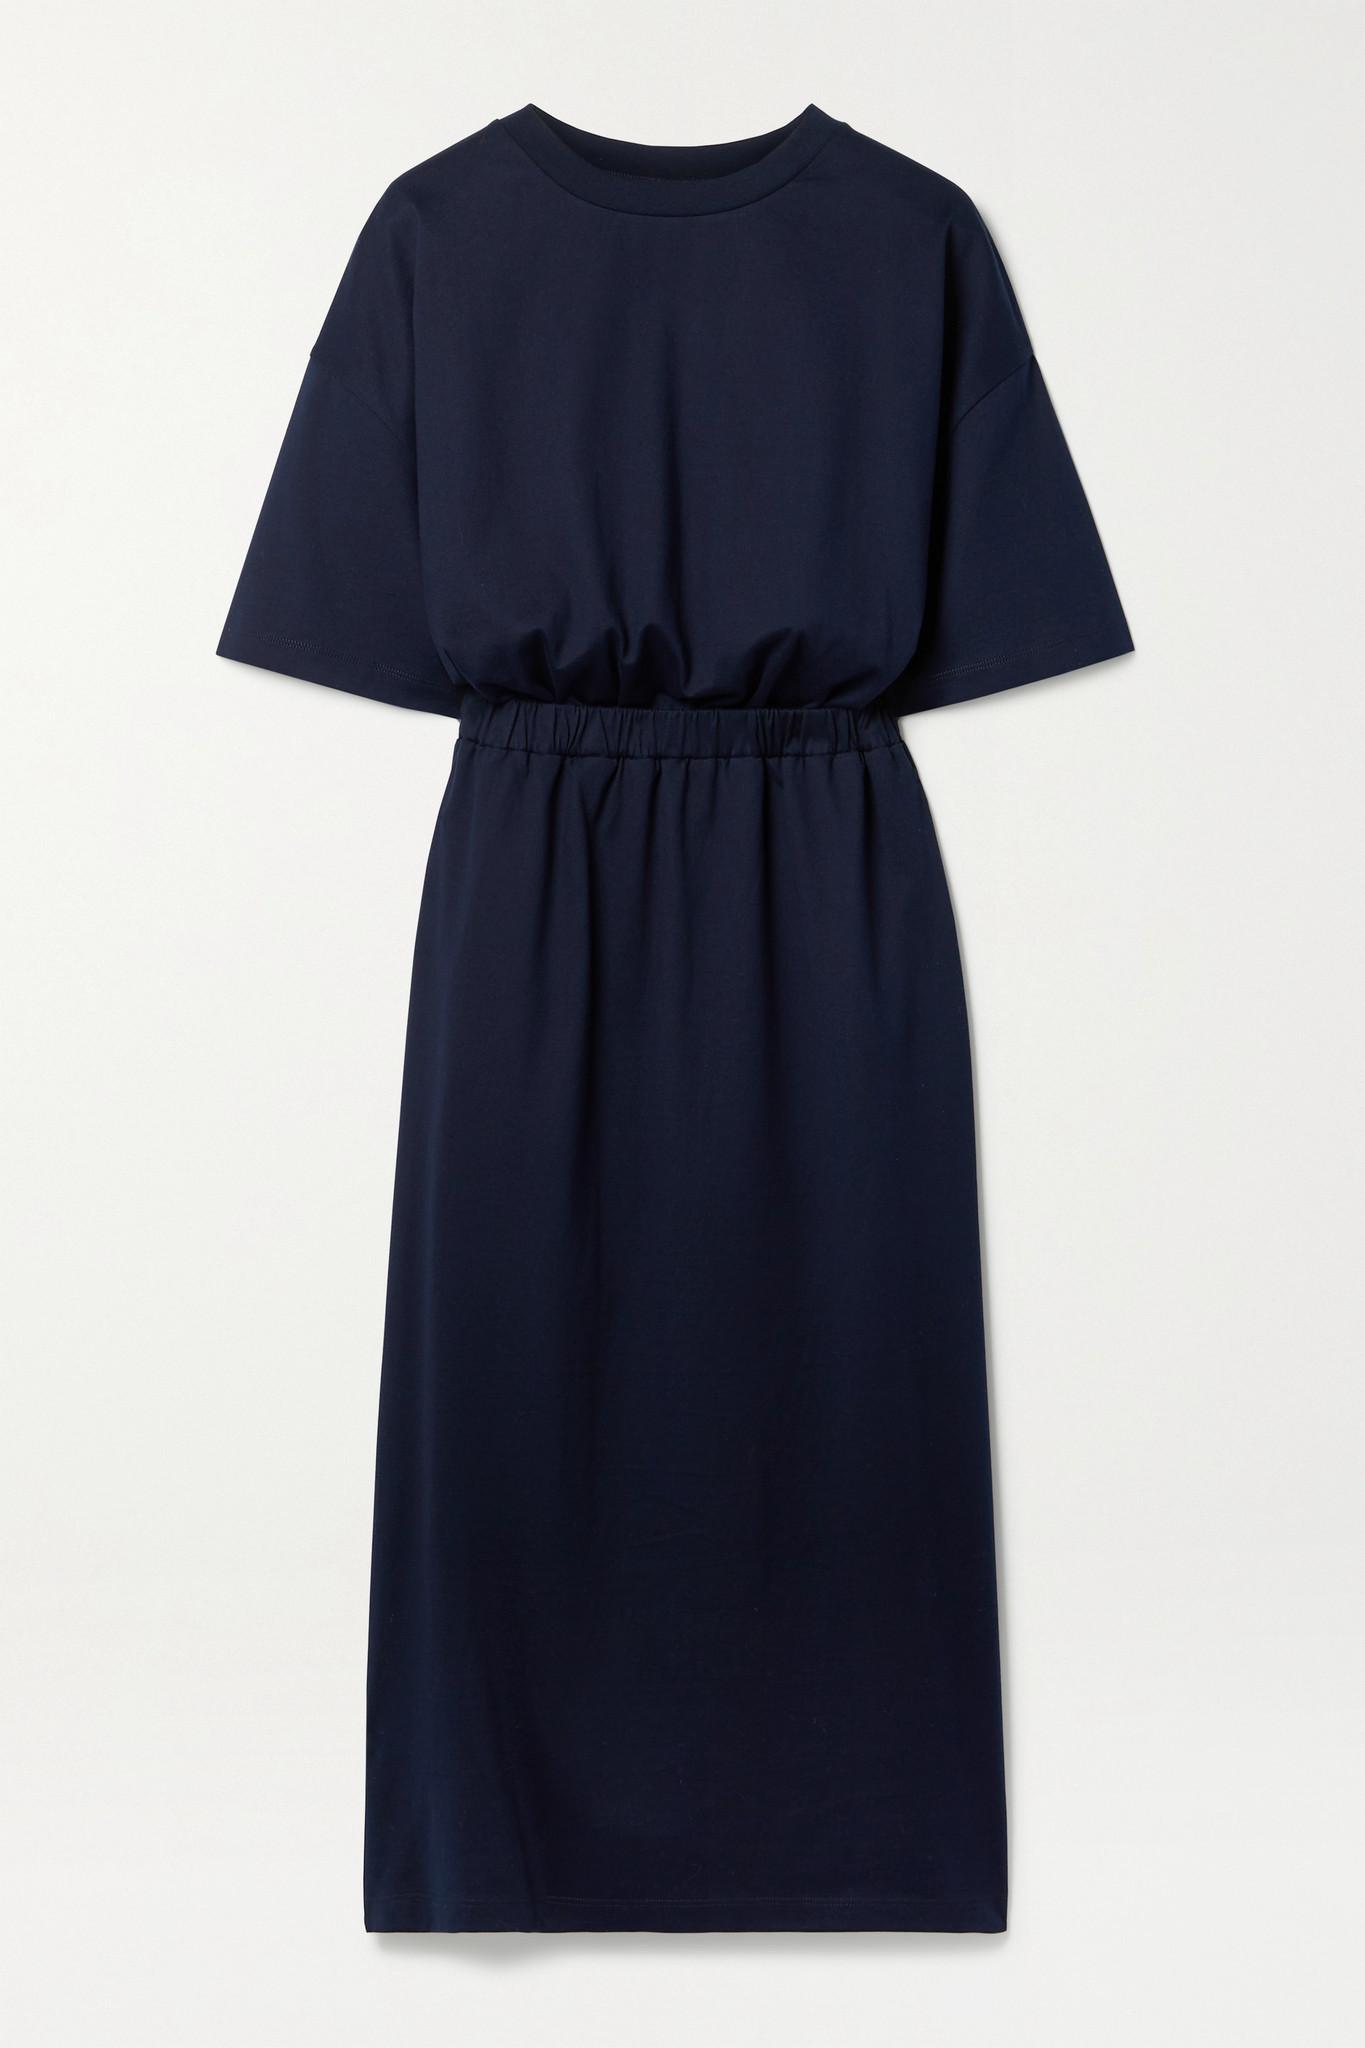 NINETY PERCENT - 【net Sustain】缩褶有机纯棉平纹布中长连衣裙 - 蓝色 - large